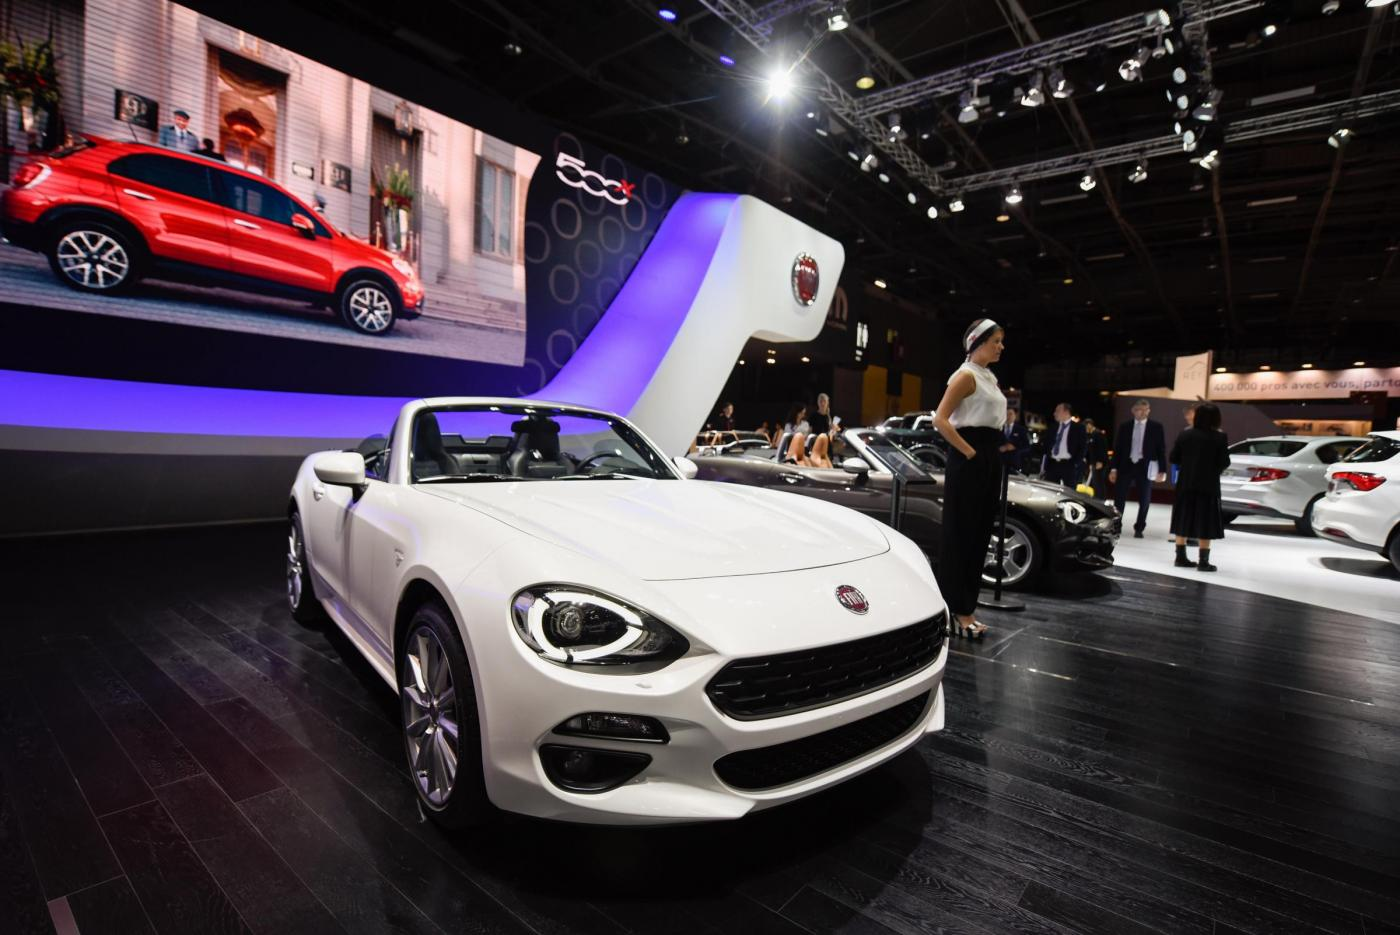 Paris motor show 2016 - Paris motor show ...